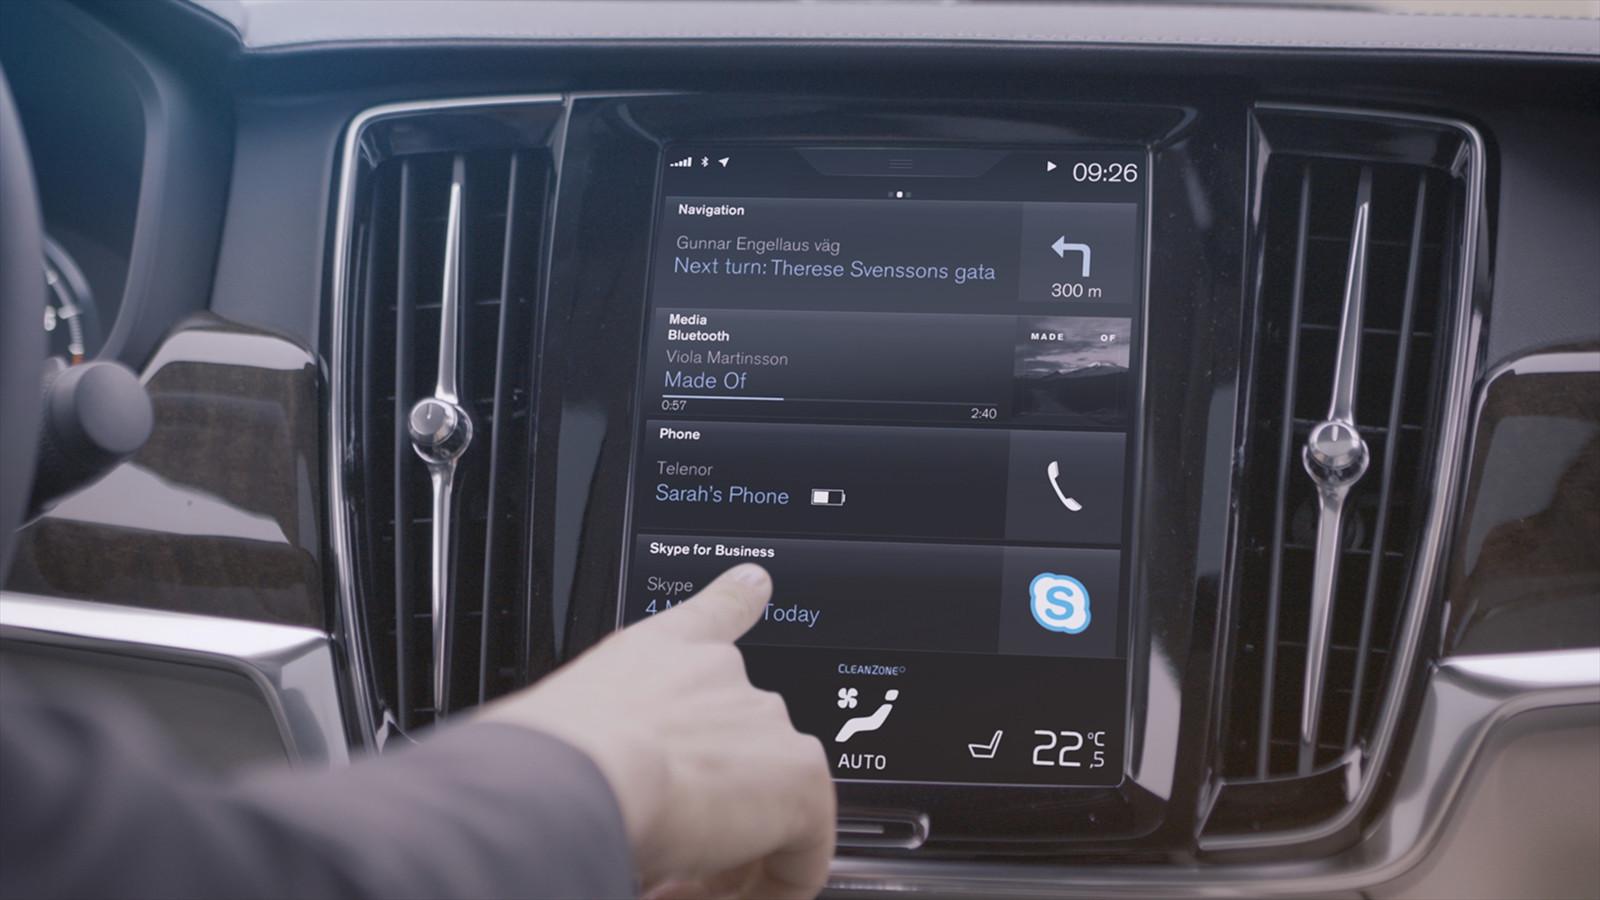 Автомобили Вольво XC90, S90 иV90 будут оборудованы сервисом Skype for Business